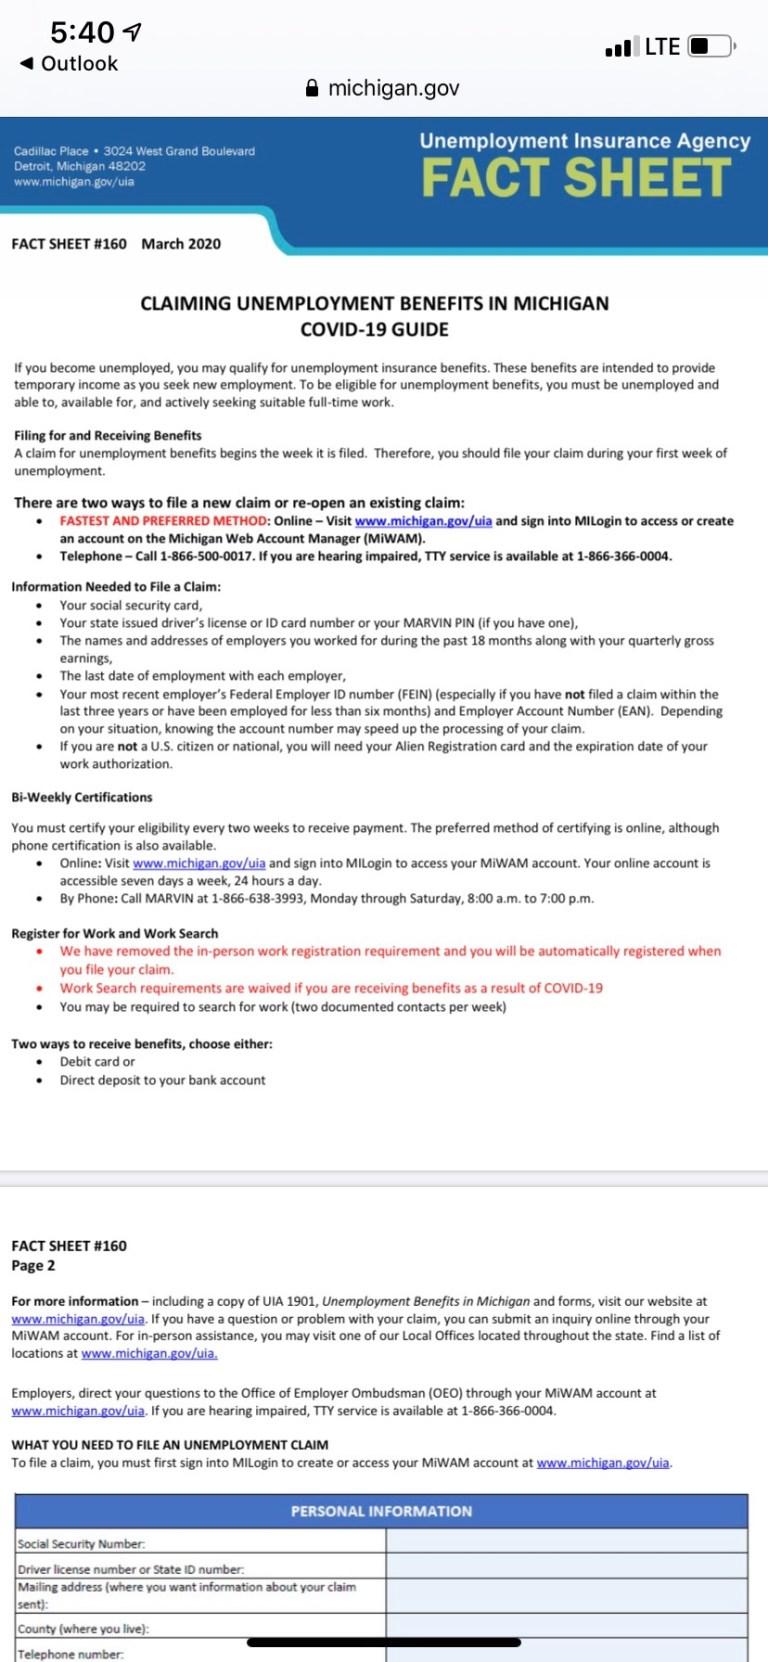 httpswww.michigan.govdocumentsuia160_-_Claiming_UI_Benefit_In_Michigan_-_Jan2014_444213_7.pdf